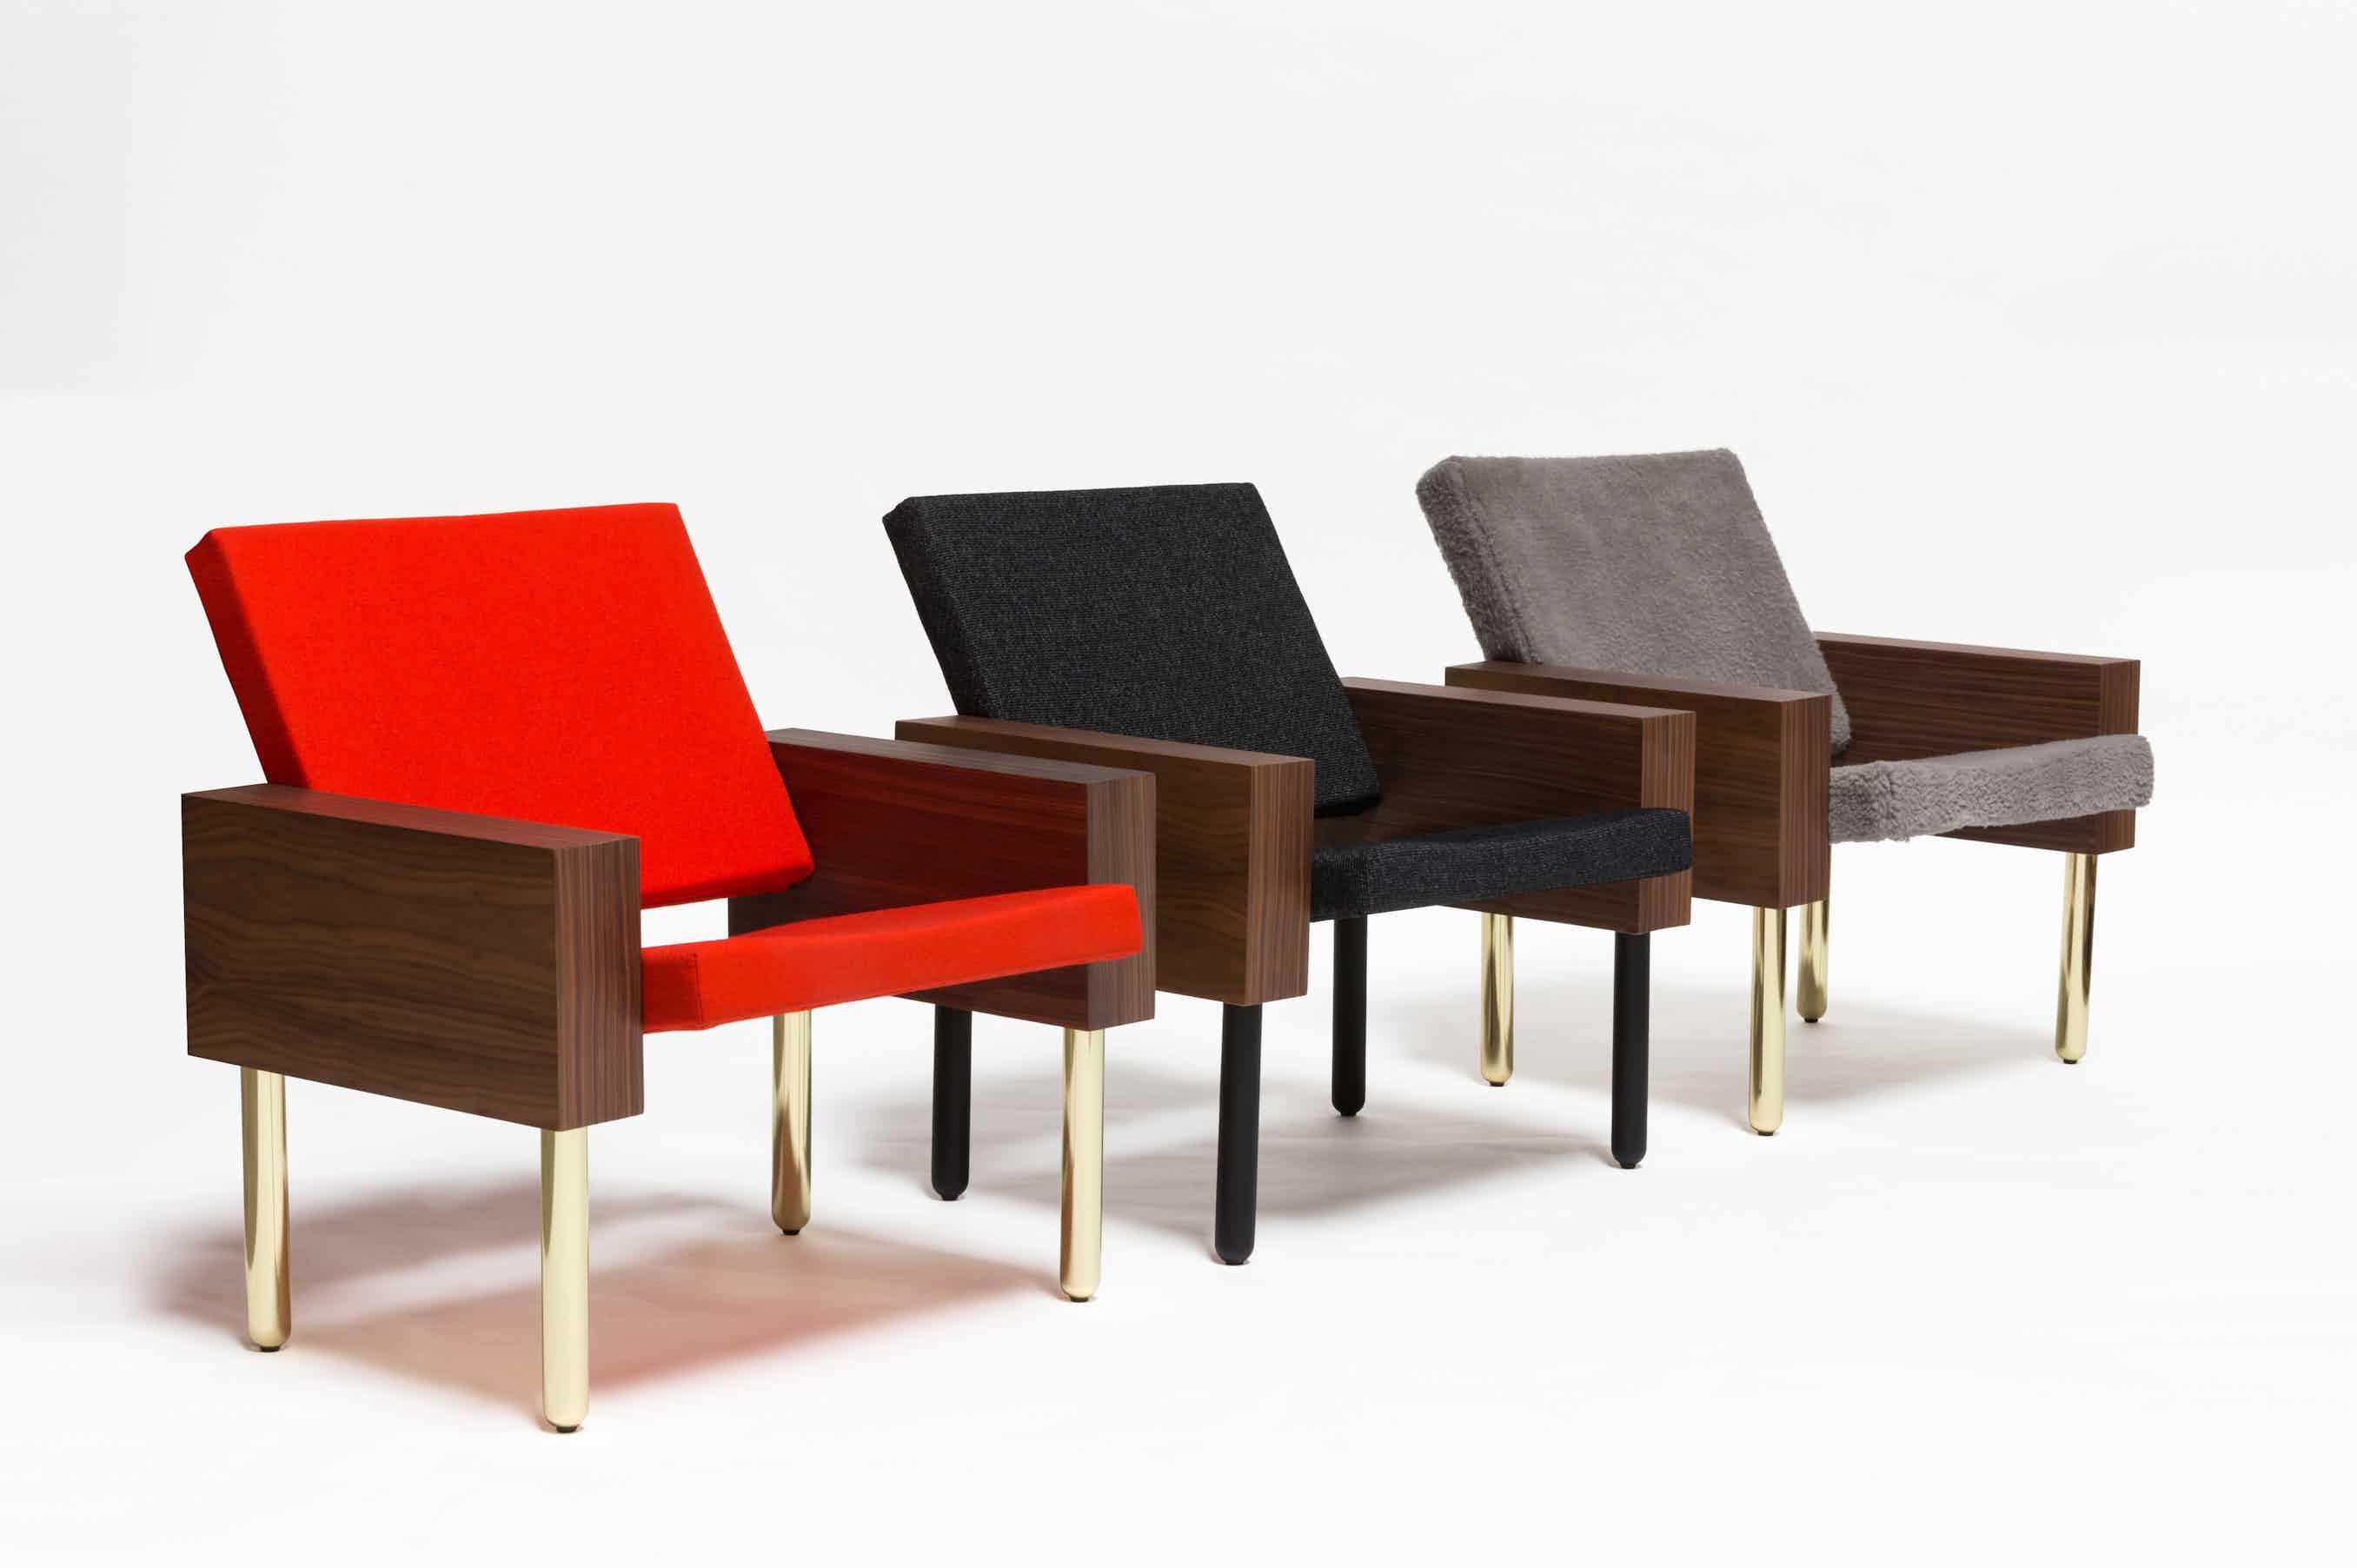 La-chance-furniture-block-armchair-trio-haute-living